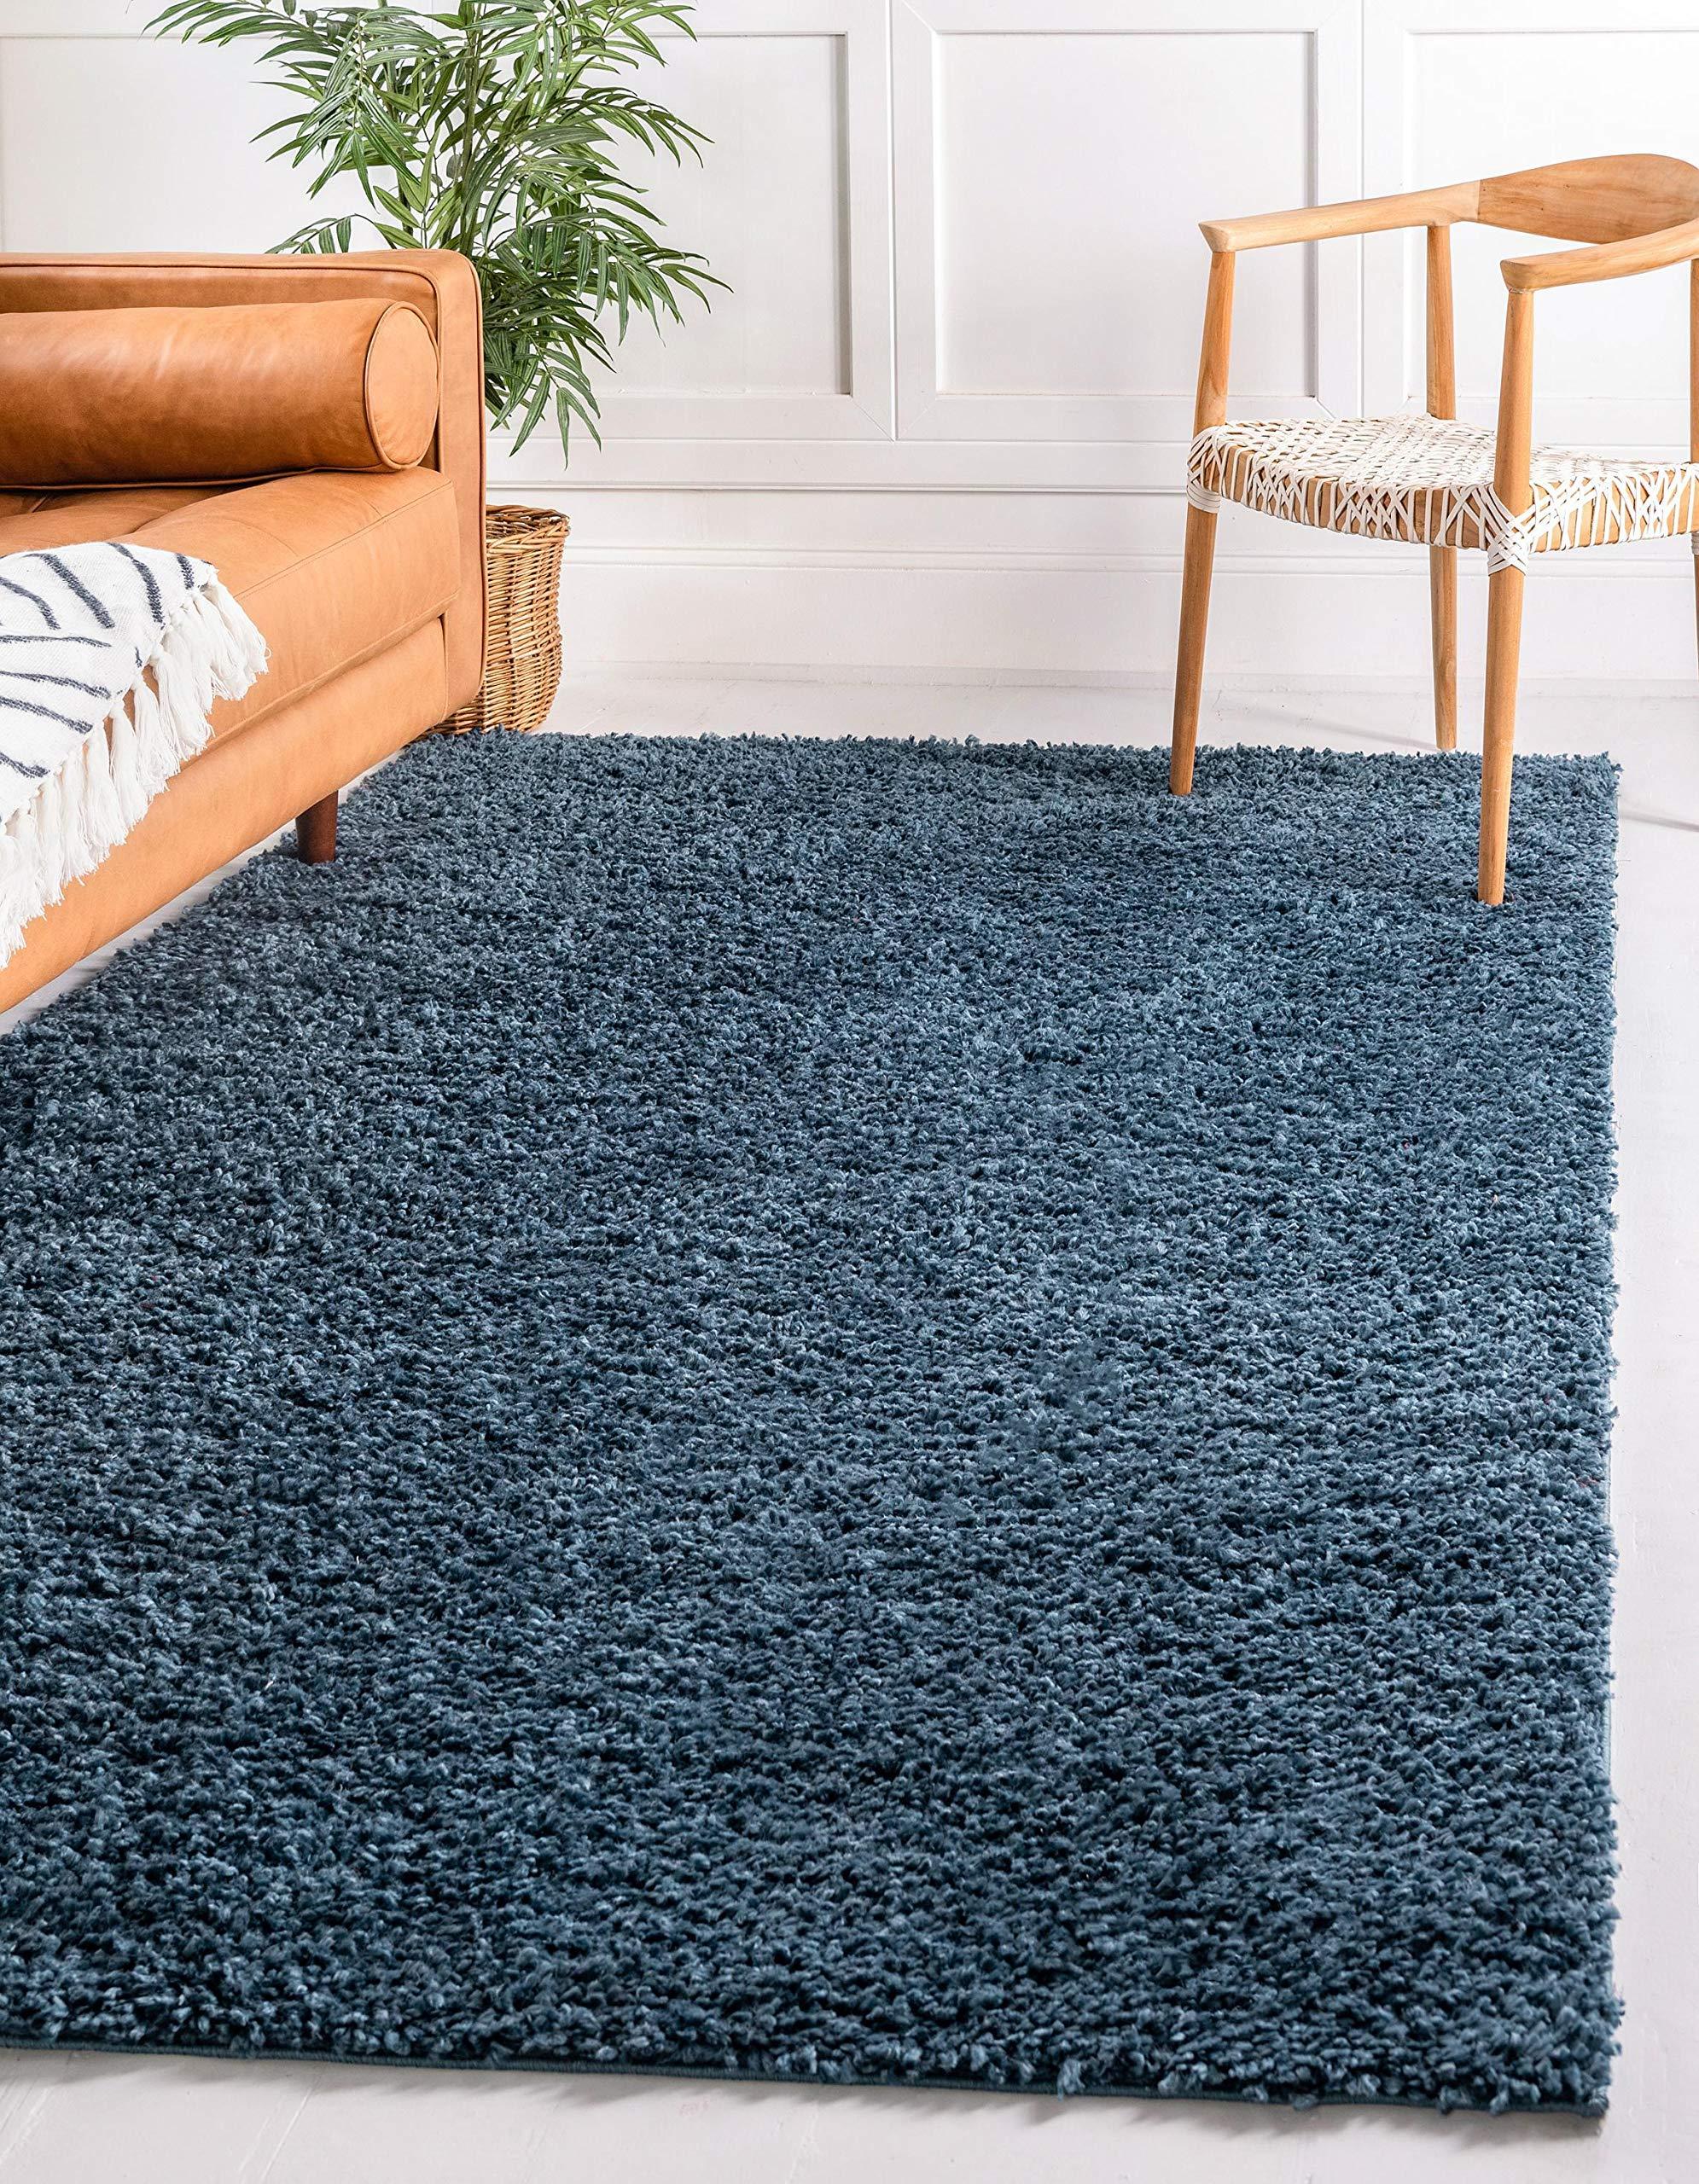 Unique Loom Davos Shag Collection Contemporary Soft Cozy Solid Shag Marine Blue Area Rug (9' 0 x 12' 0)